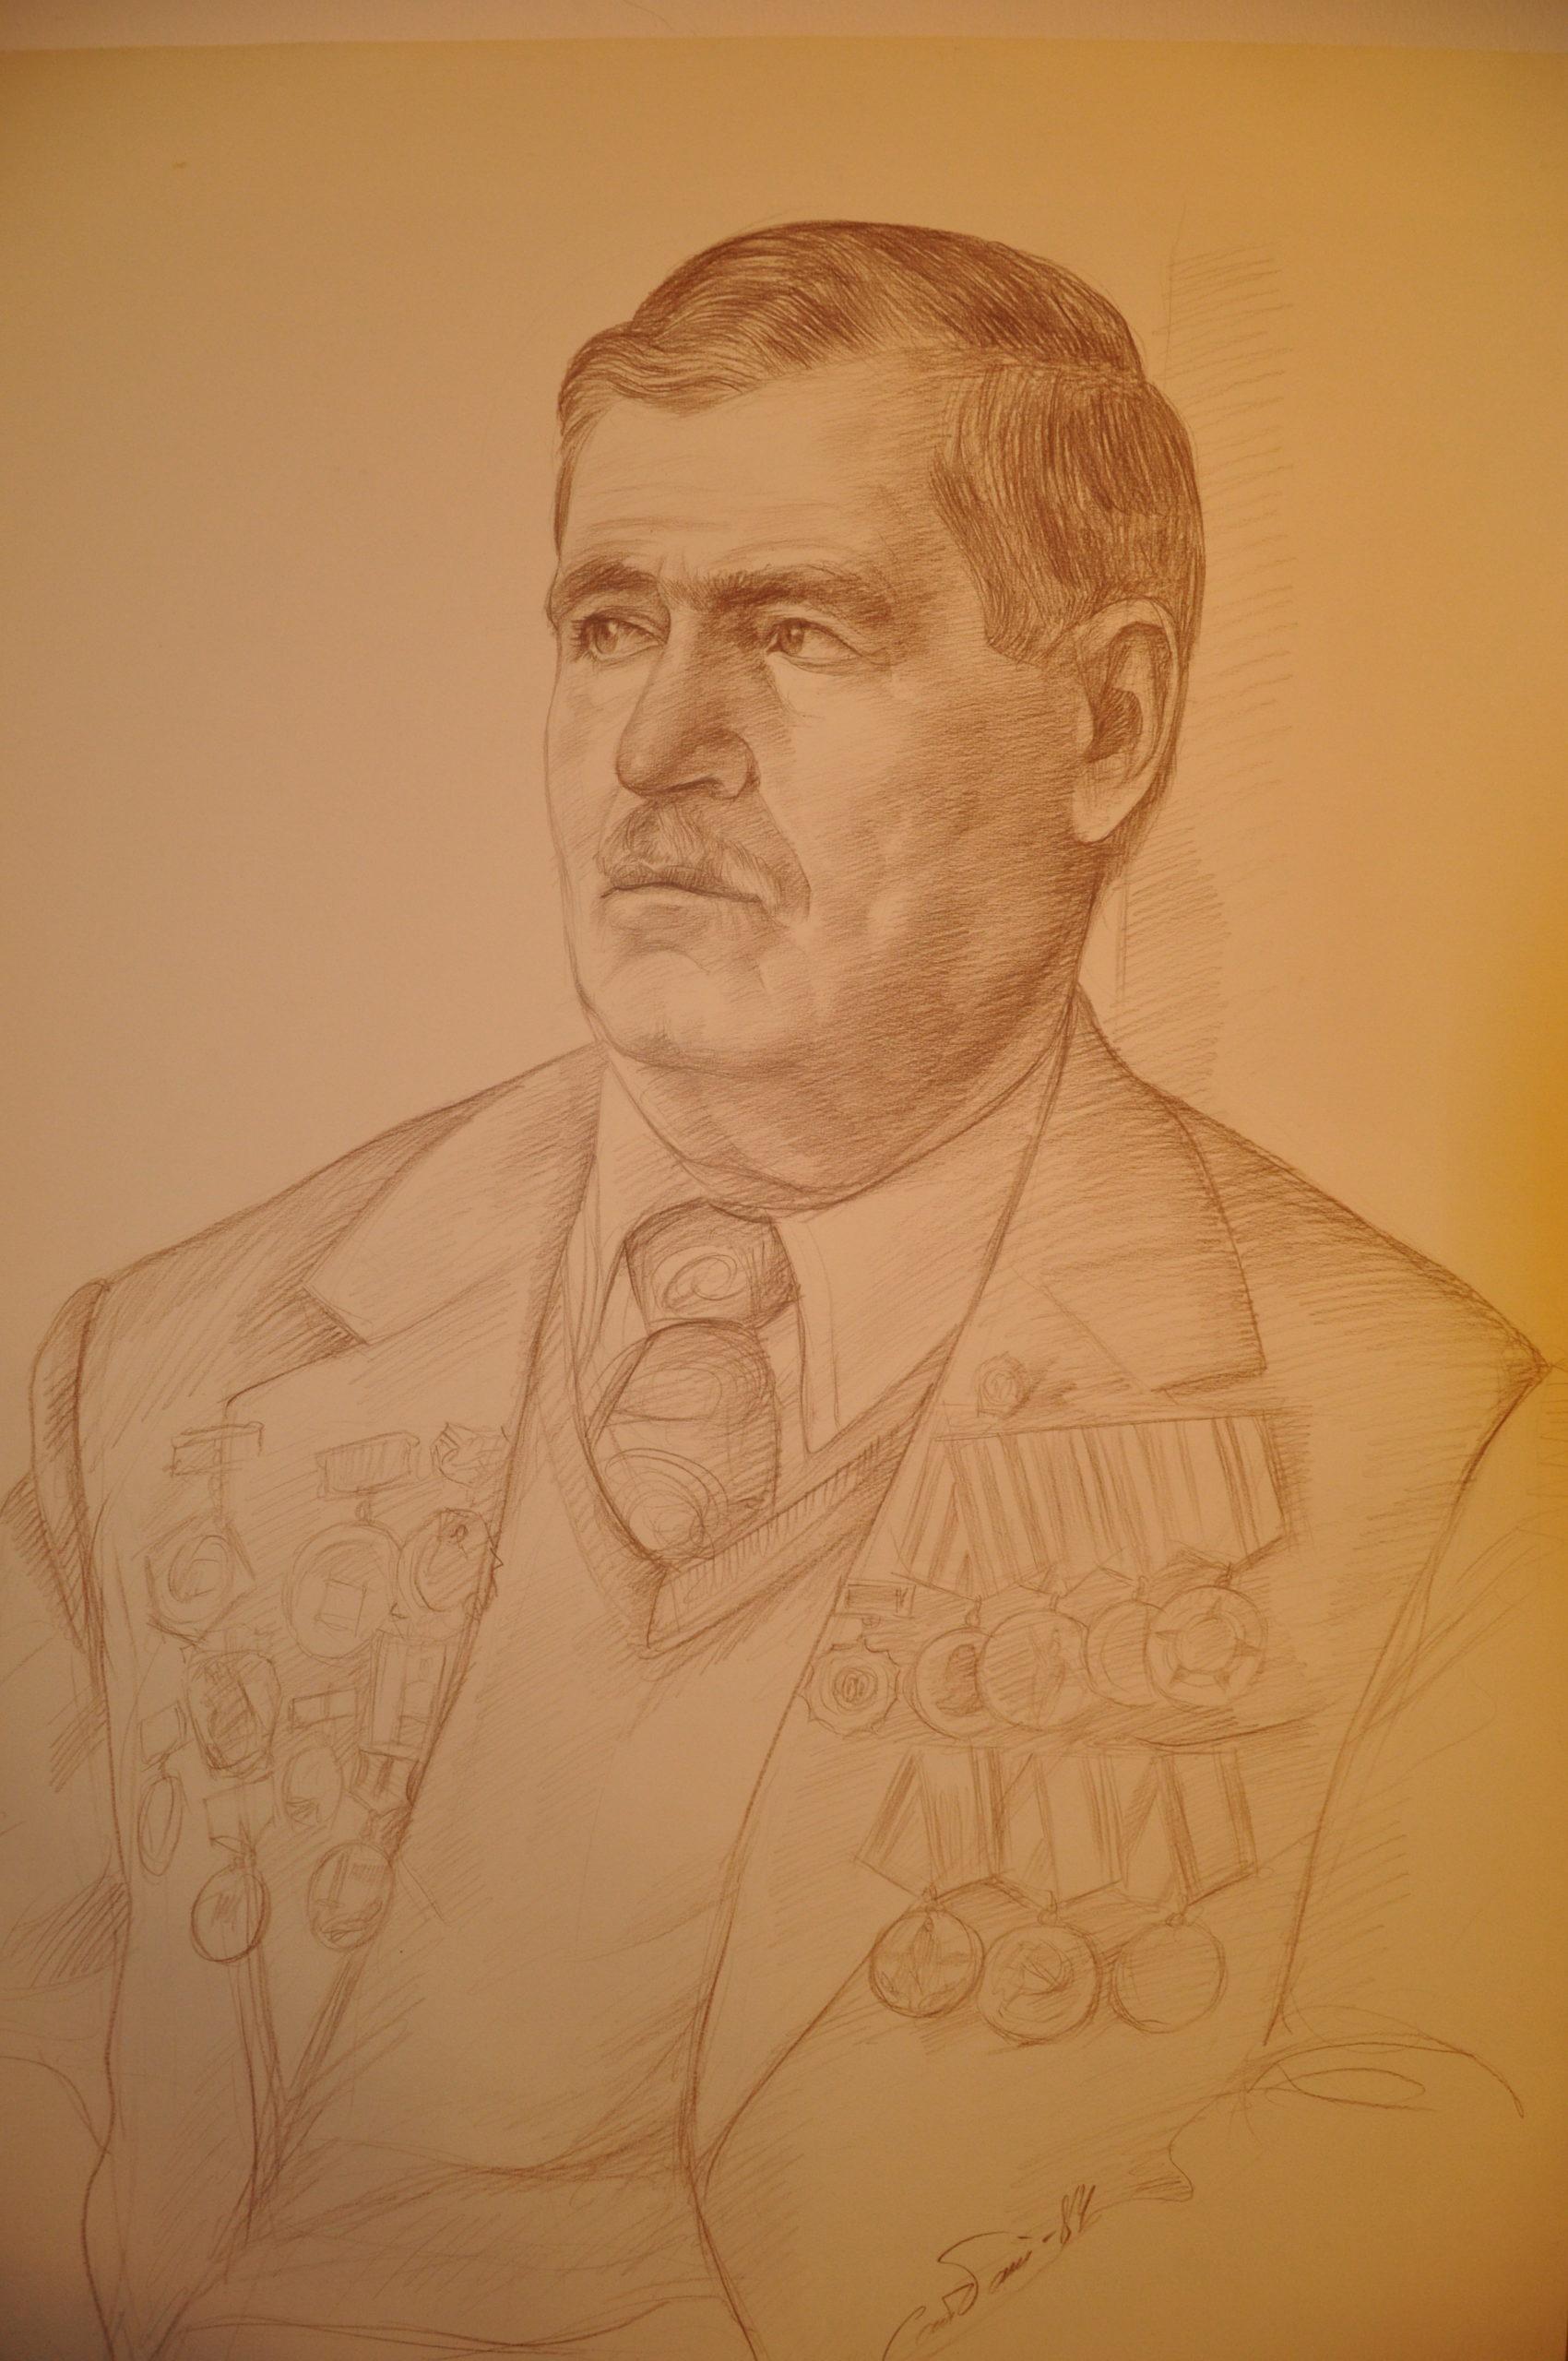 Элбакидзе Григорий Васильевич